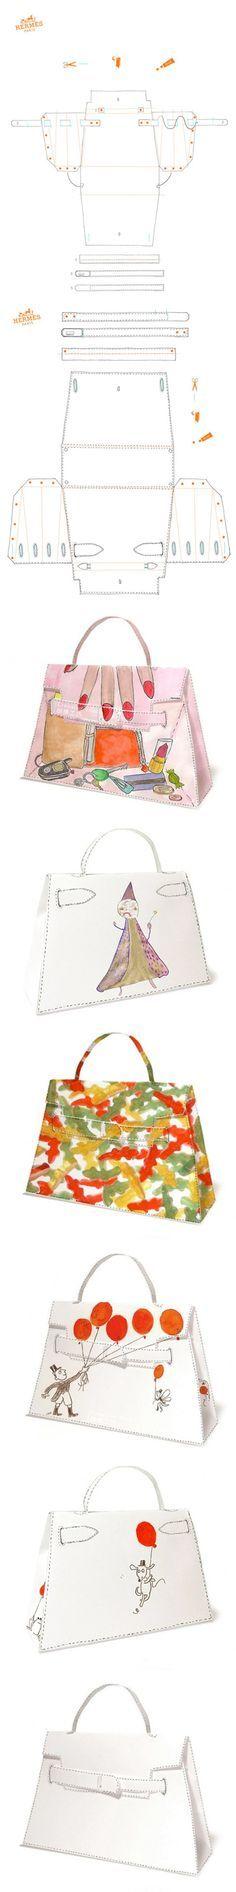 It's a paper Kelly bag pattern! Purse Patterns, Sewing Patterns, Sewing Crafts, Sewing Projects, Craft Bags, Diy Bags, Diy Purse, Leather Pattern, Leather Projects